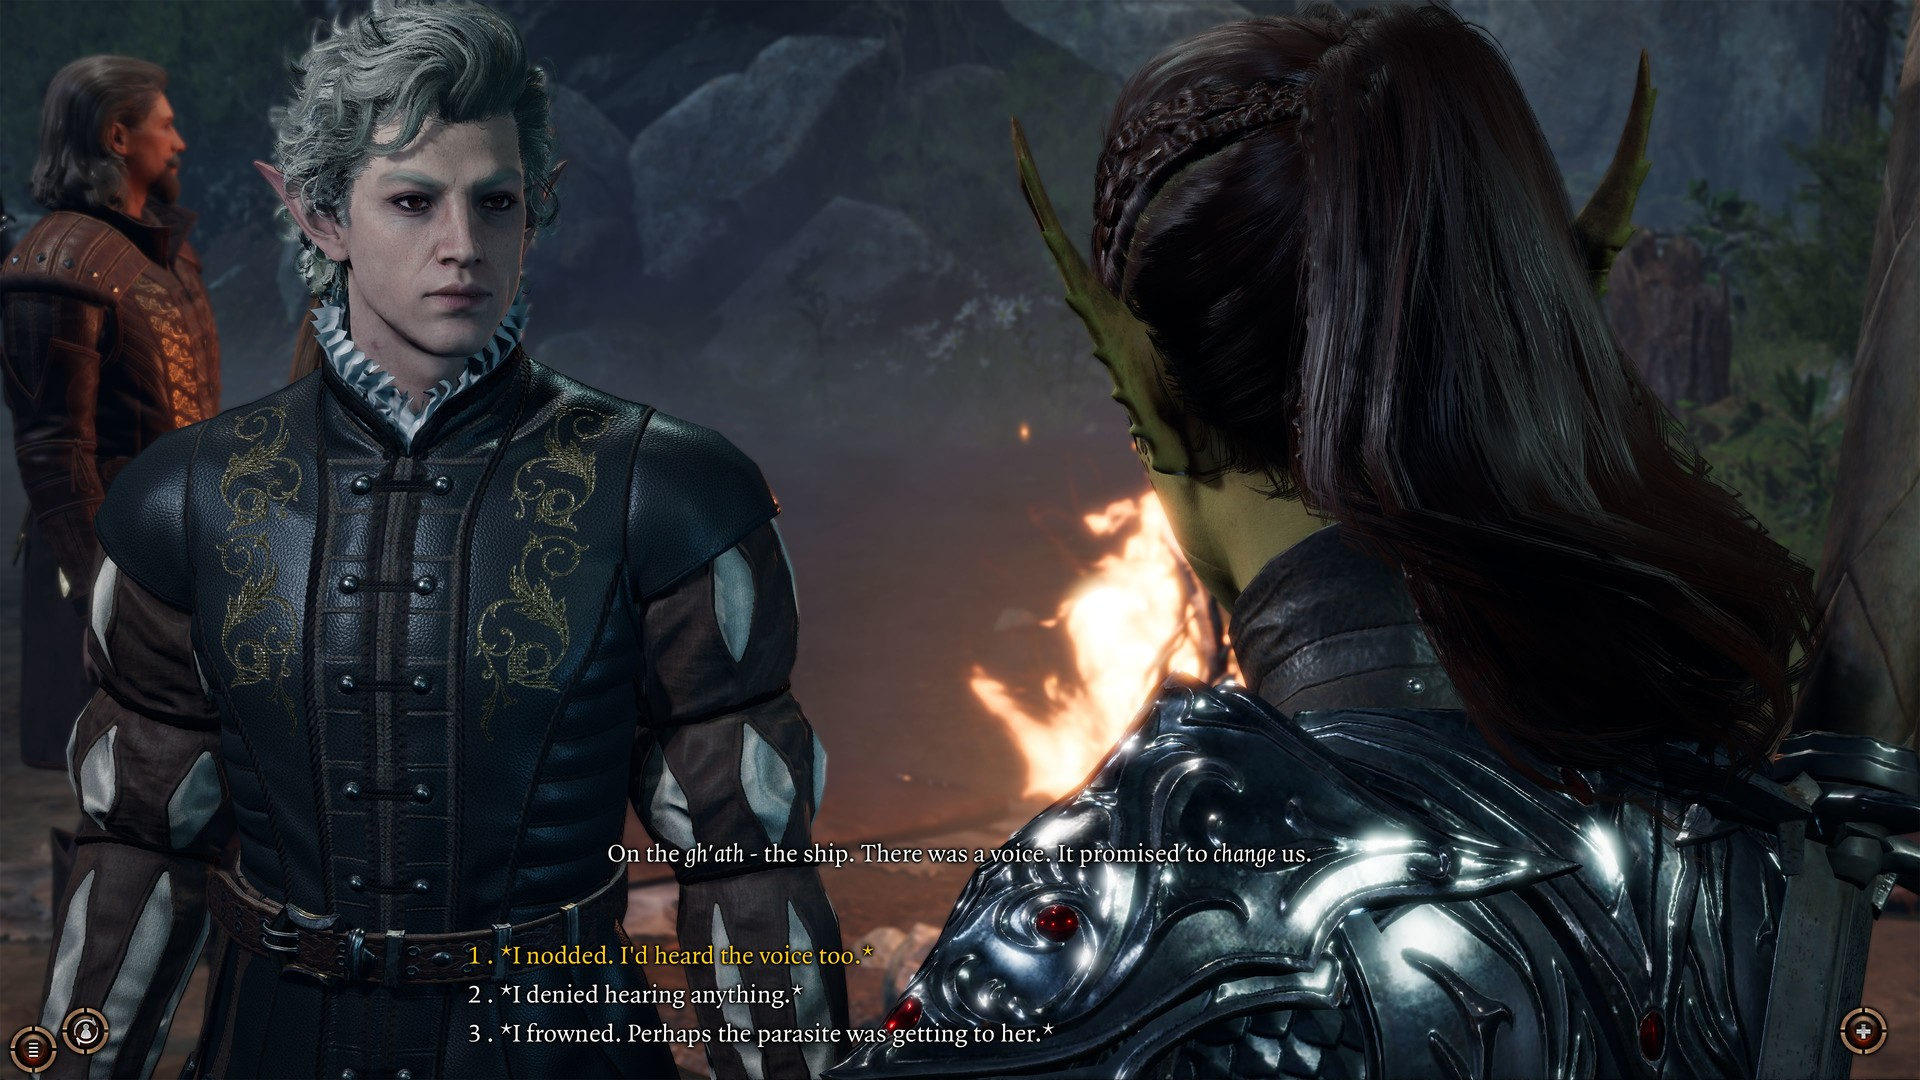 Screenshot for the game Baldur's Gate 3 [4.1.90.6165 EA] (2020)  download torrent RePack from R. G. Mechanics